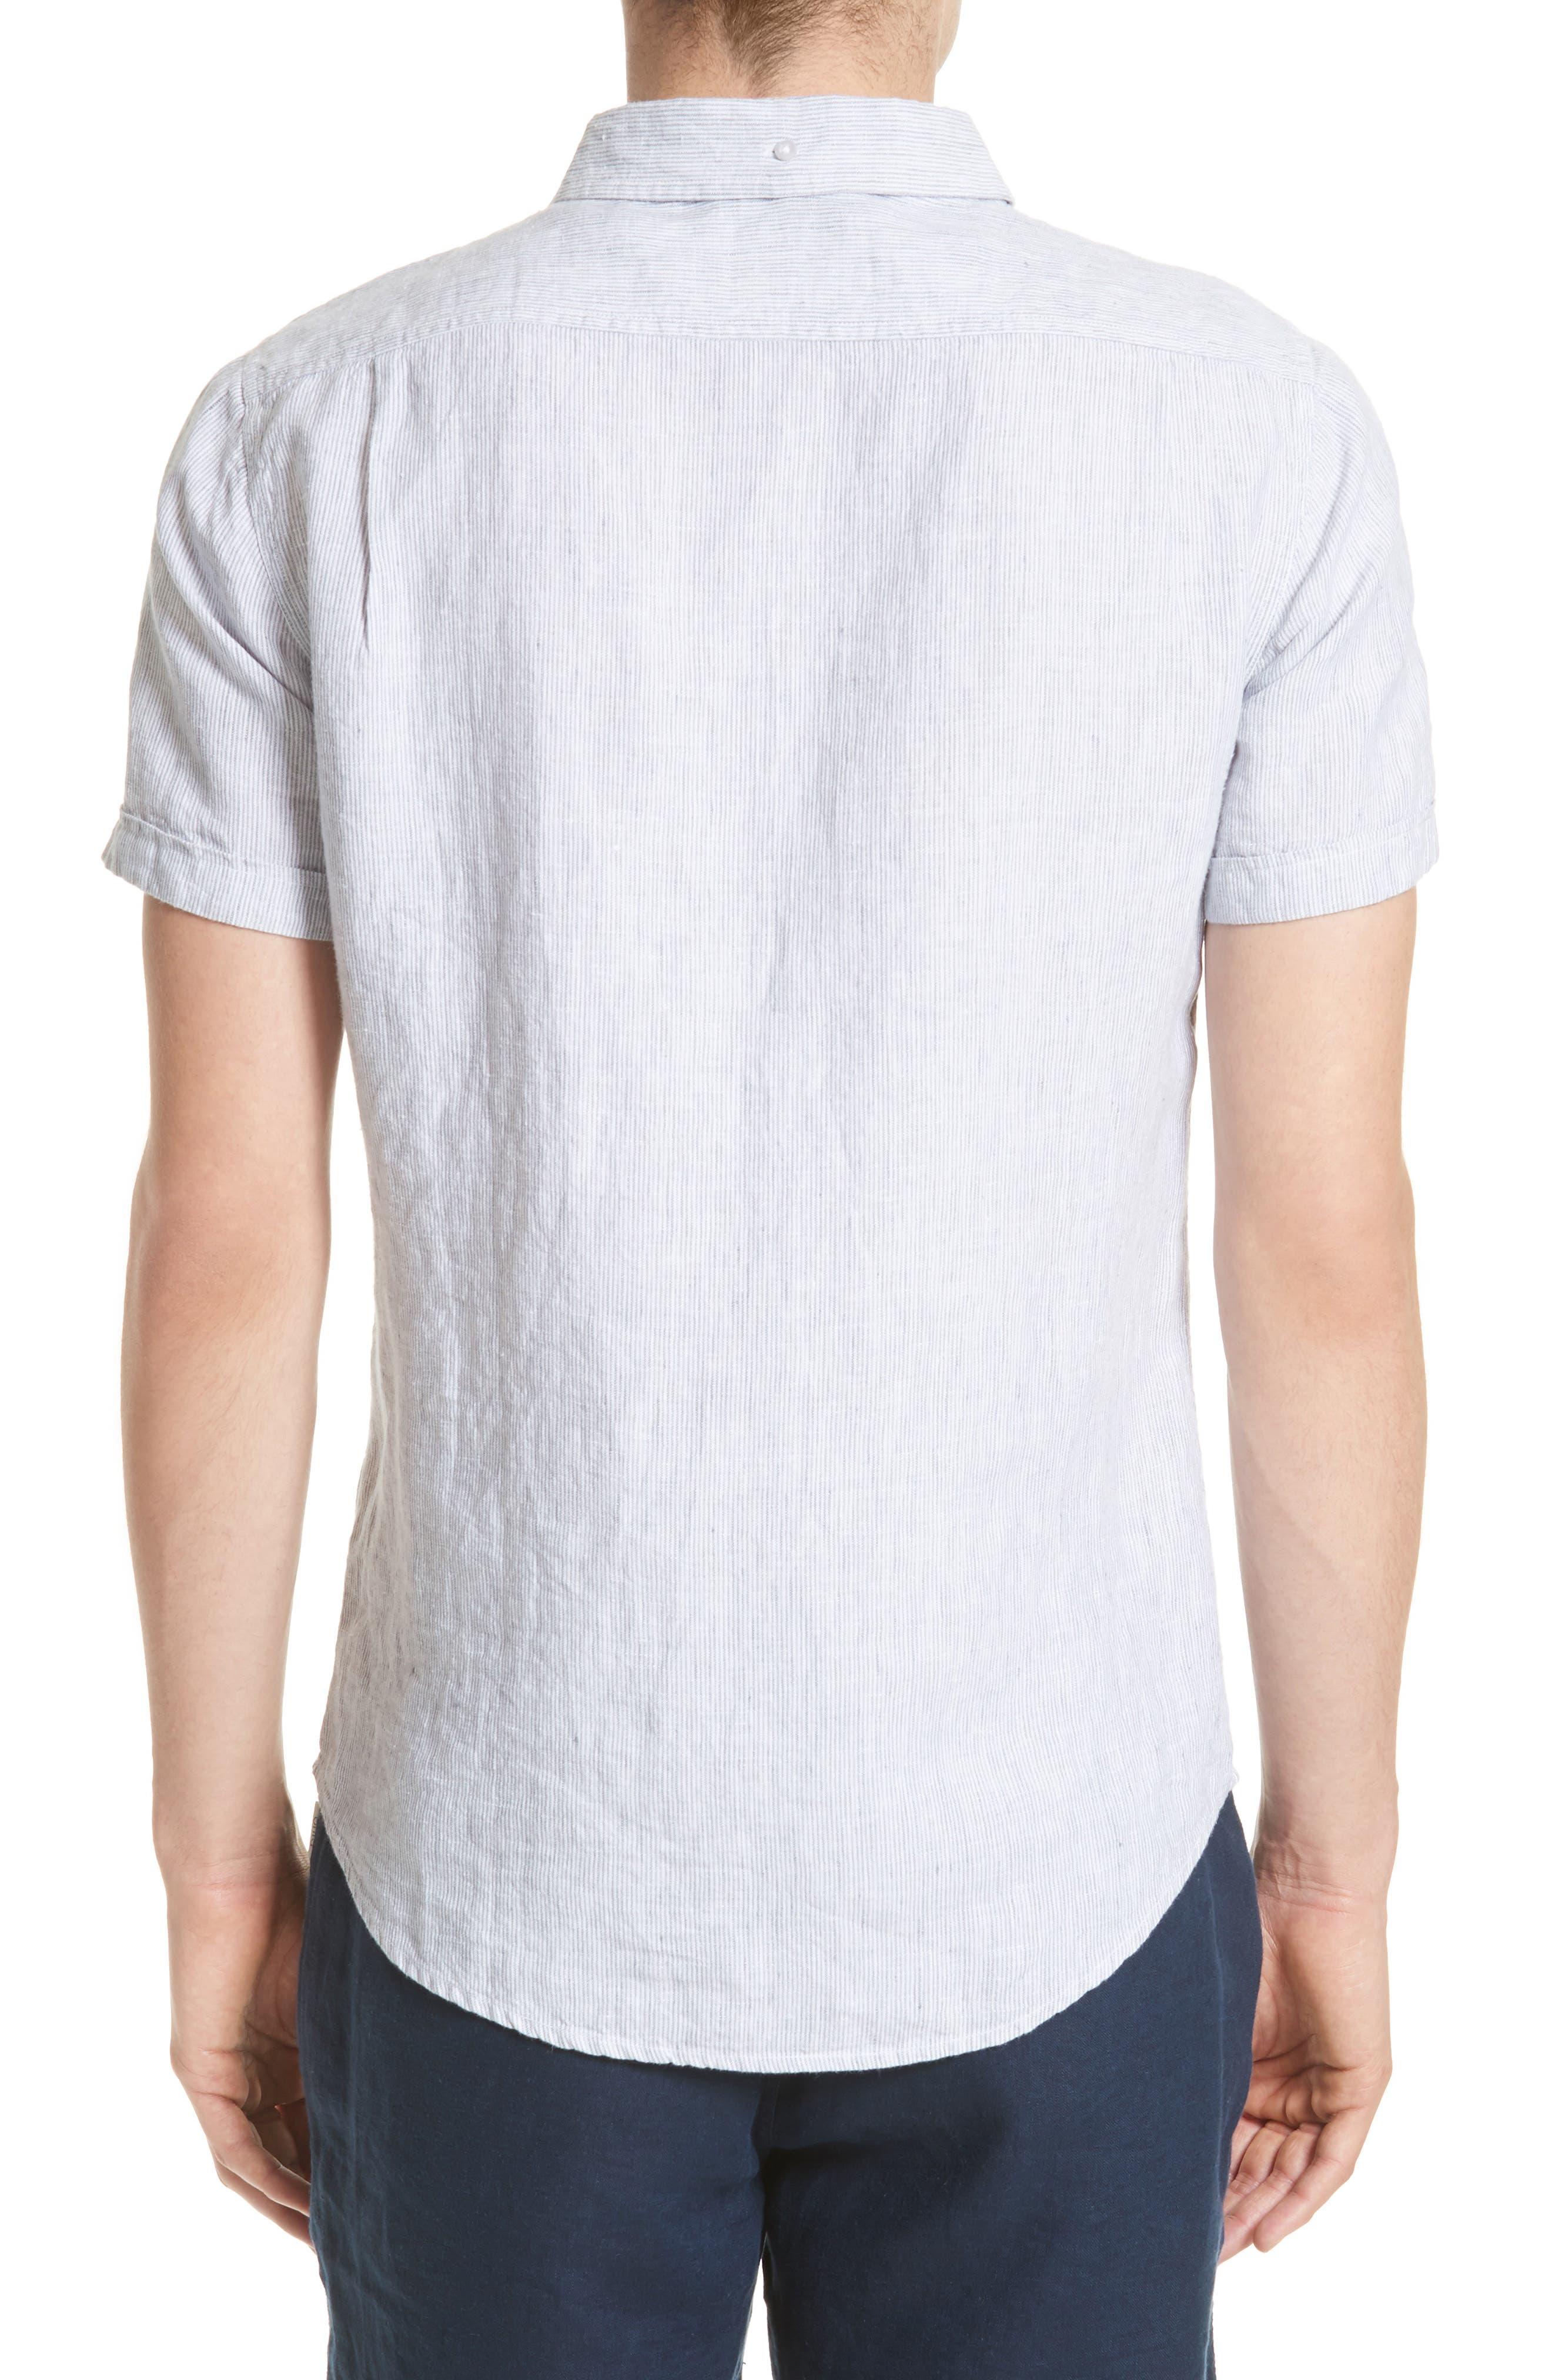 Trim Fit Microstripe Linen Shirt,                             Alternate thumbnail 3, color,                             100